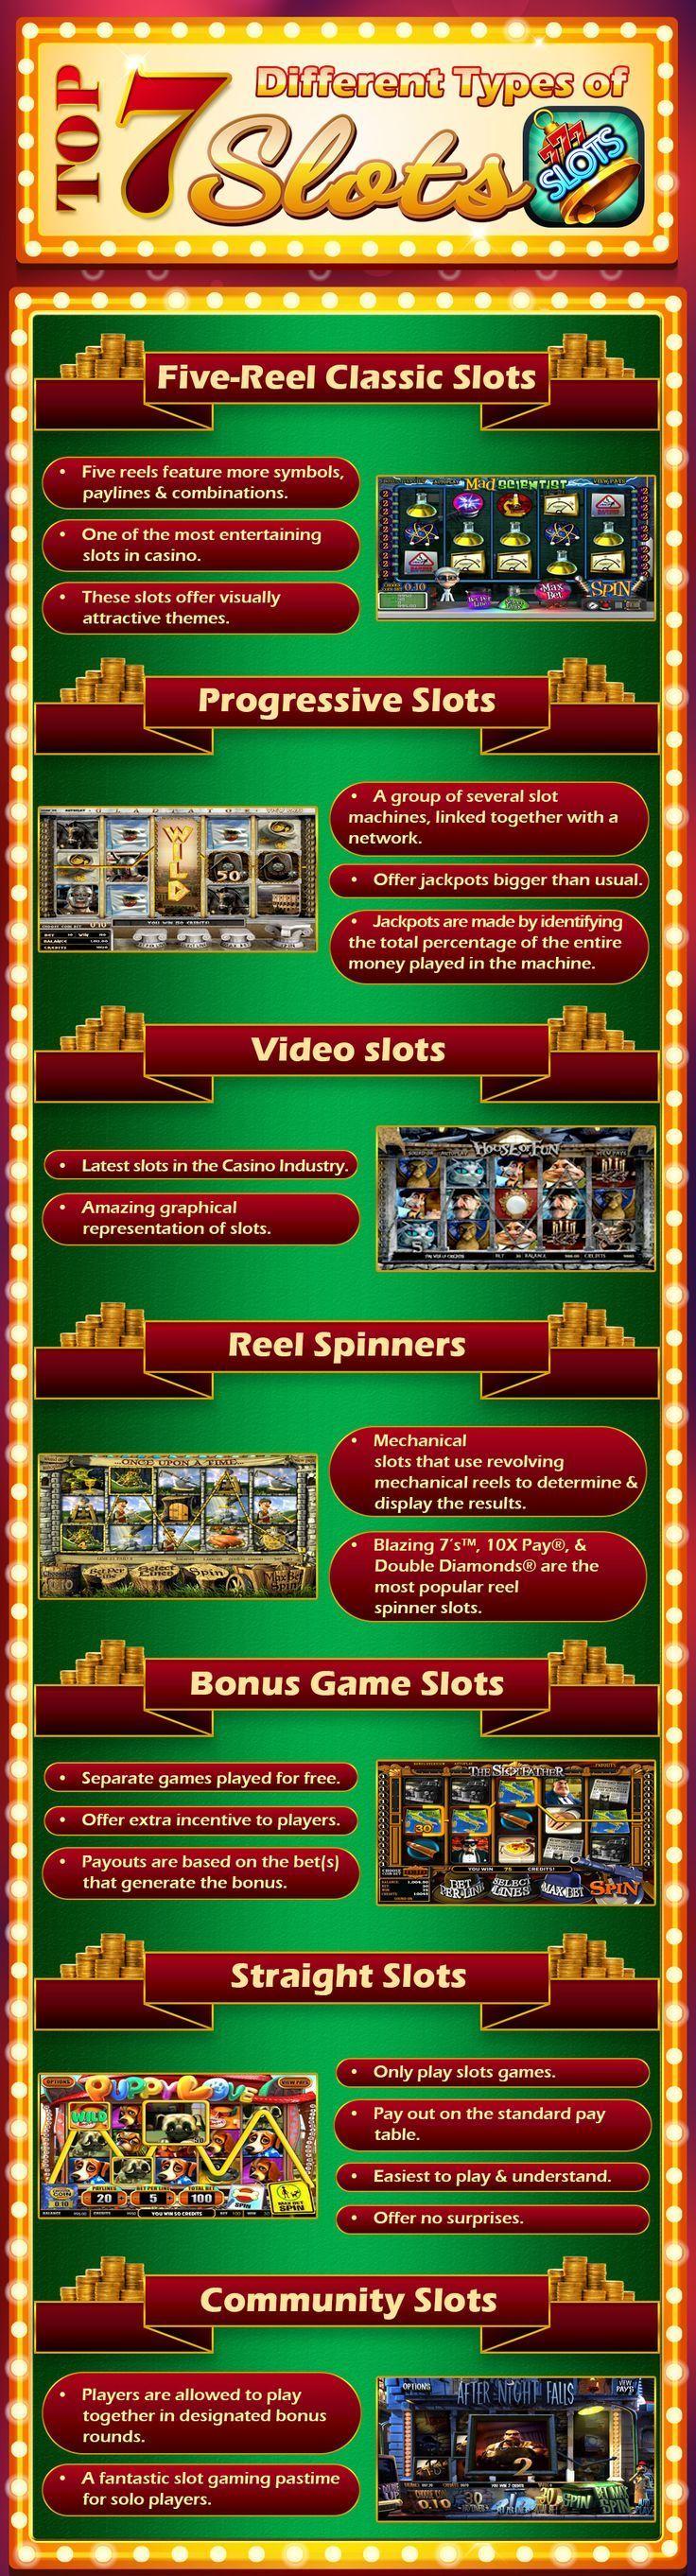 Online casino & slots.   #casino #slot #bonus #Free #gambling #game #card